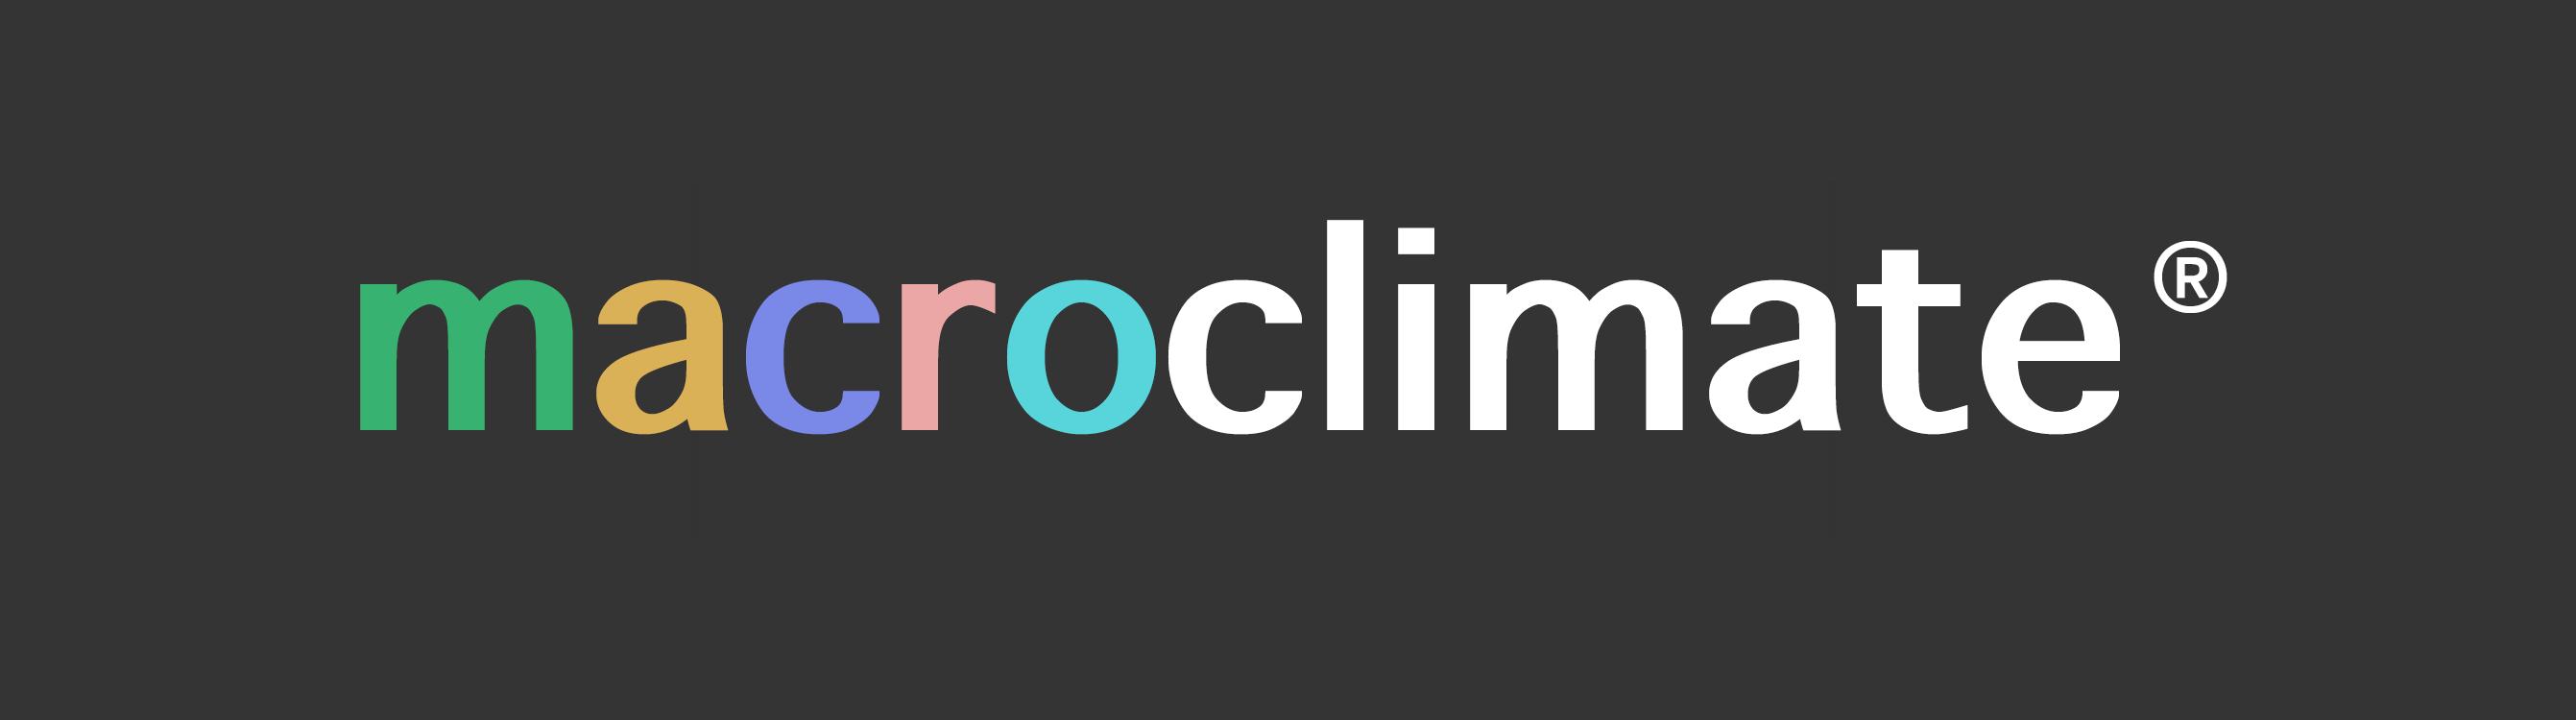 Logo for Macroclimate®